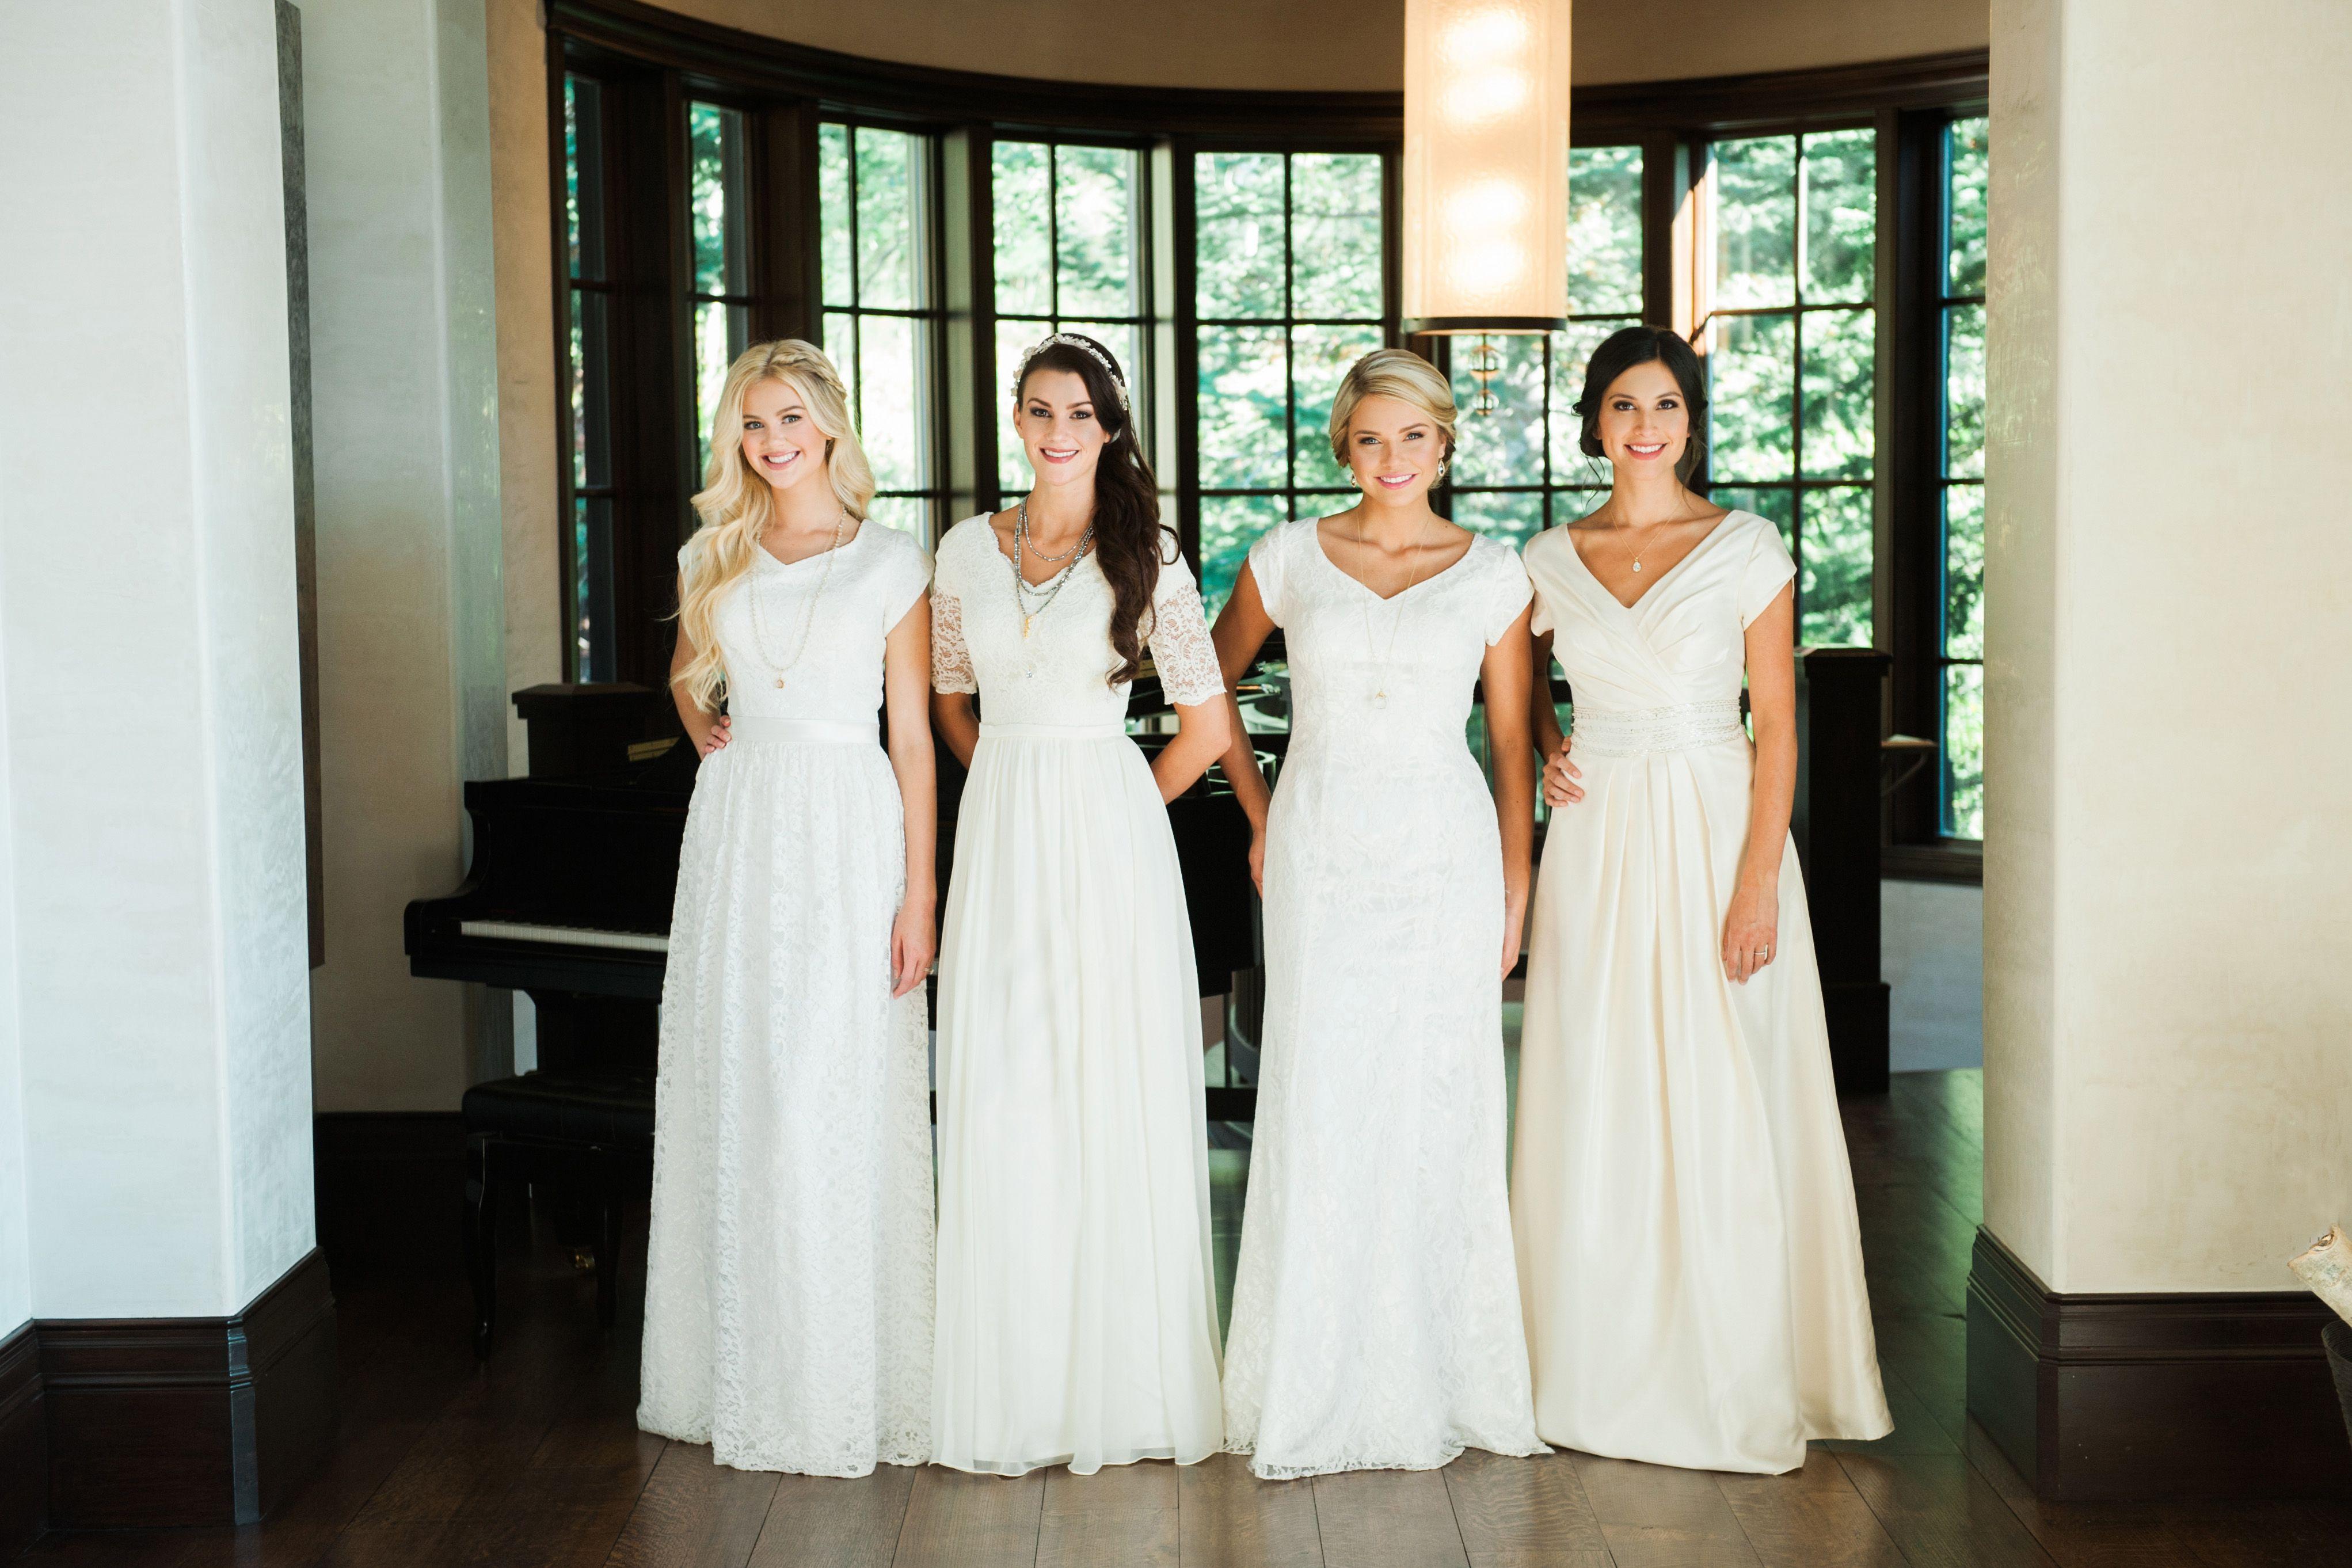 Gateway Bridal And Prom In Salt Lake City UT